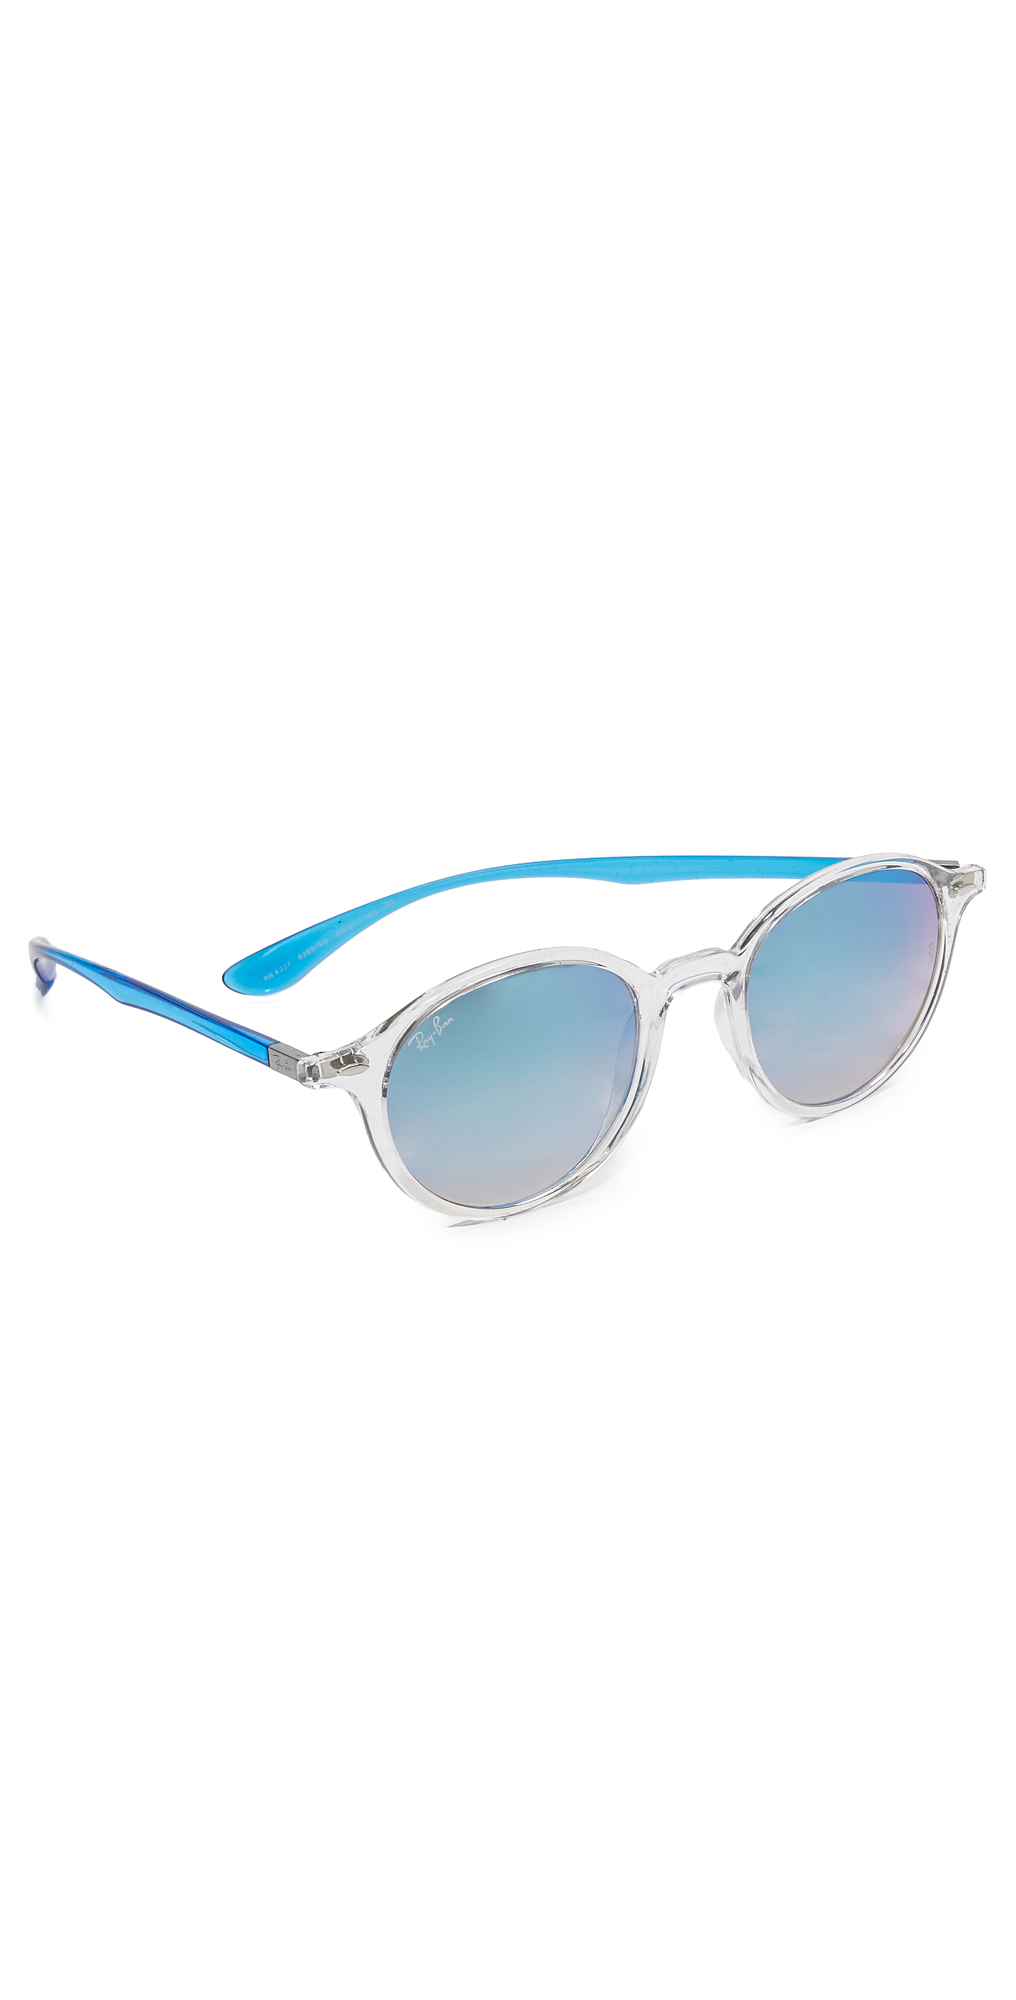 Tech Liteforce Round Flash Sunglasses Ray-Ban